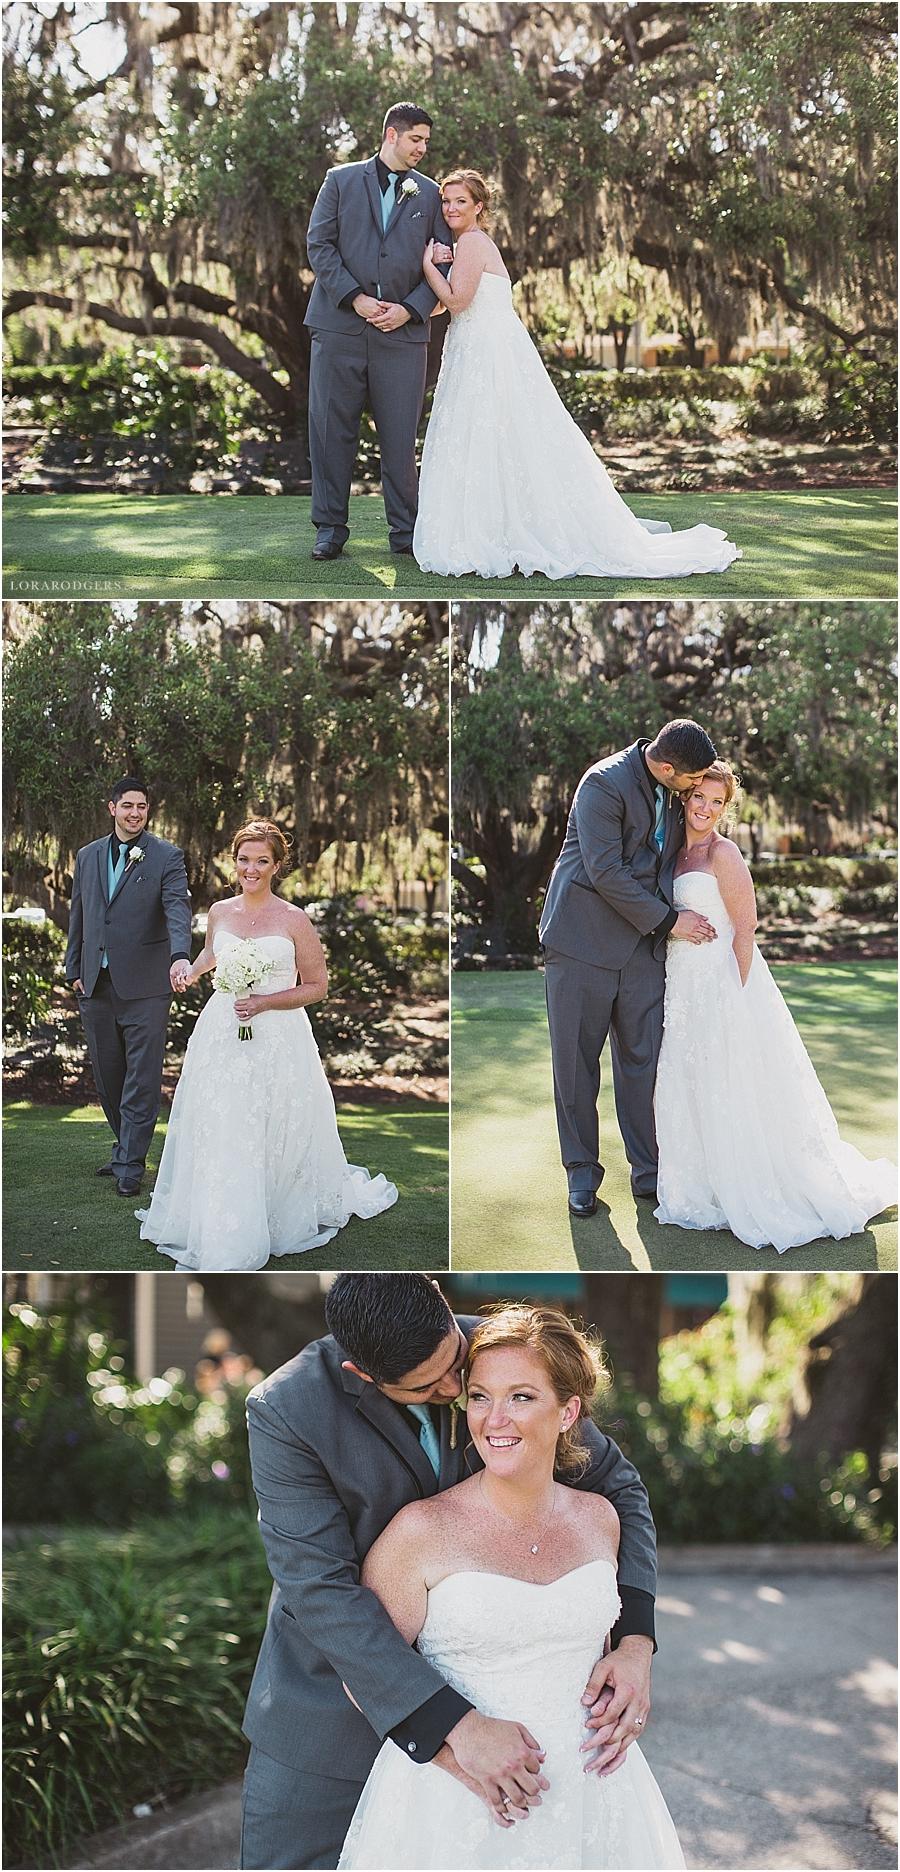 Dubsdread_Ballroom_Wedding_Orlando_Florida_008